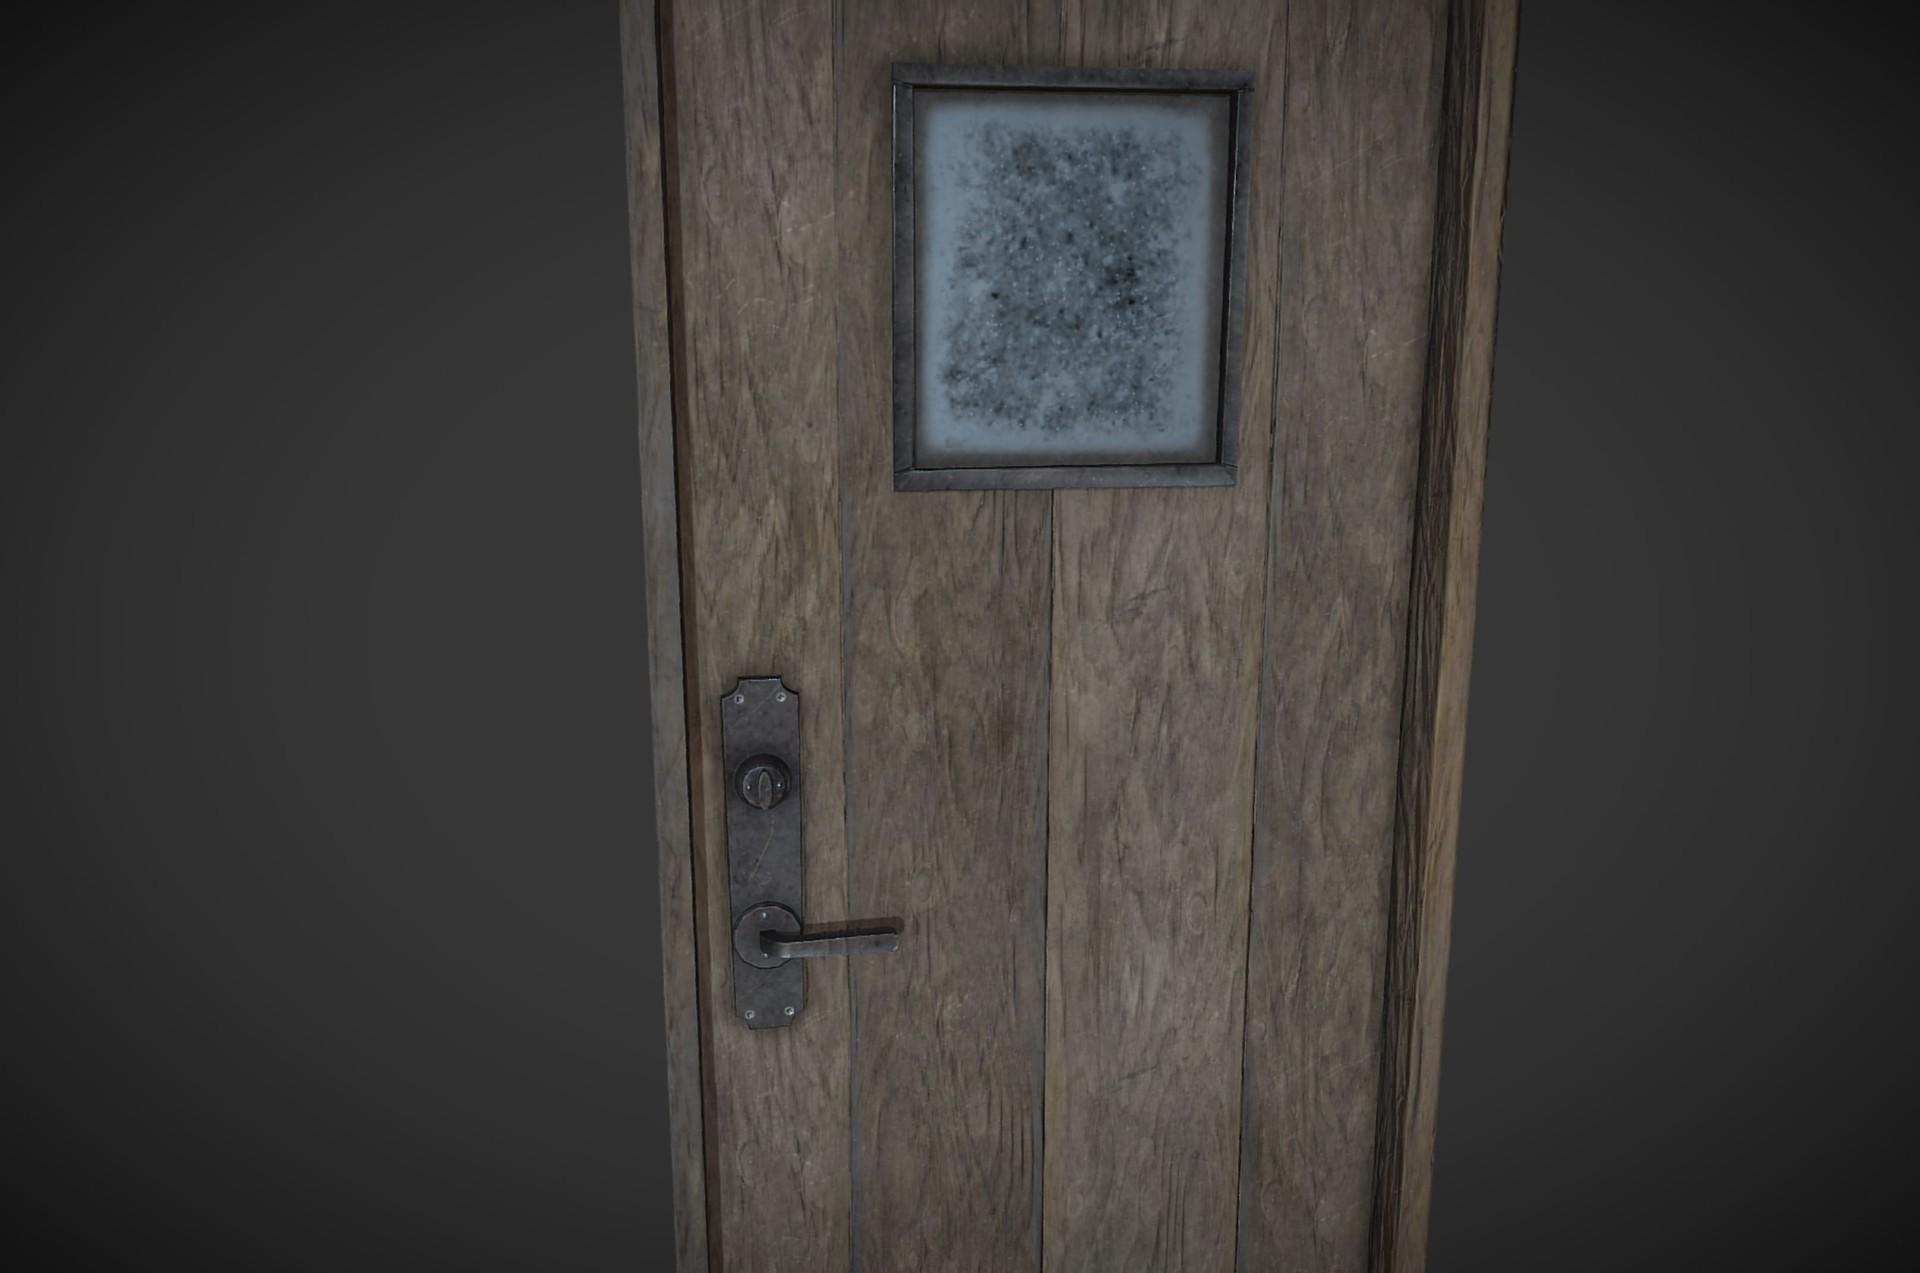 Rustic door for The Shadows Lengthen game